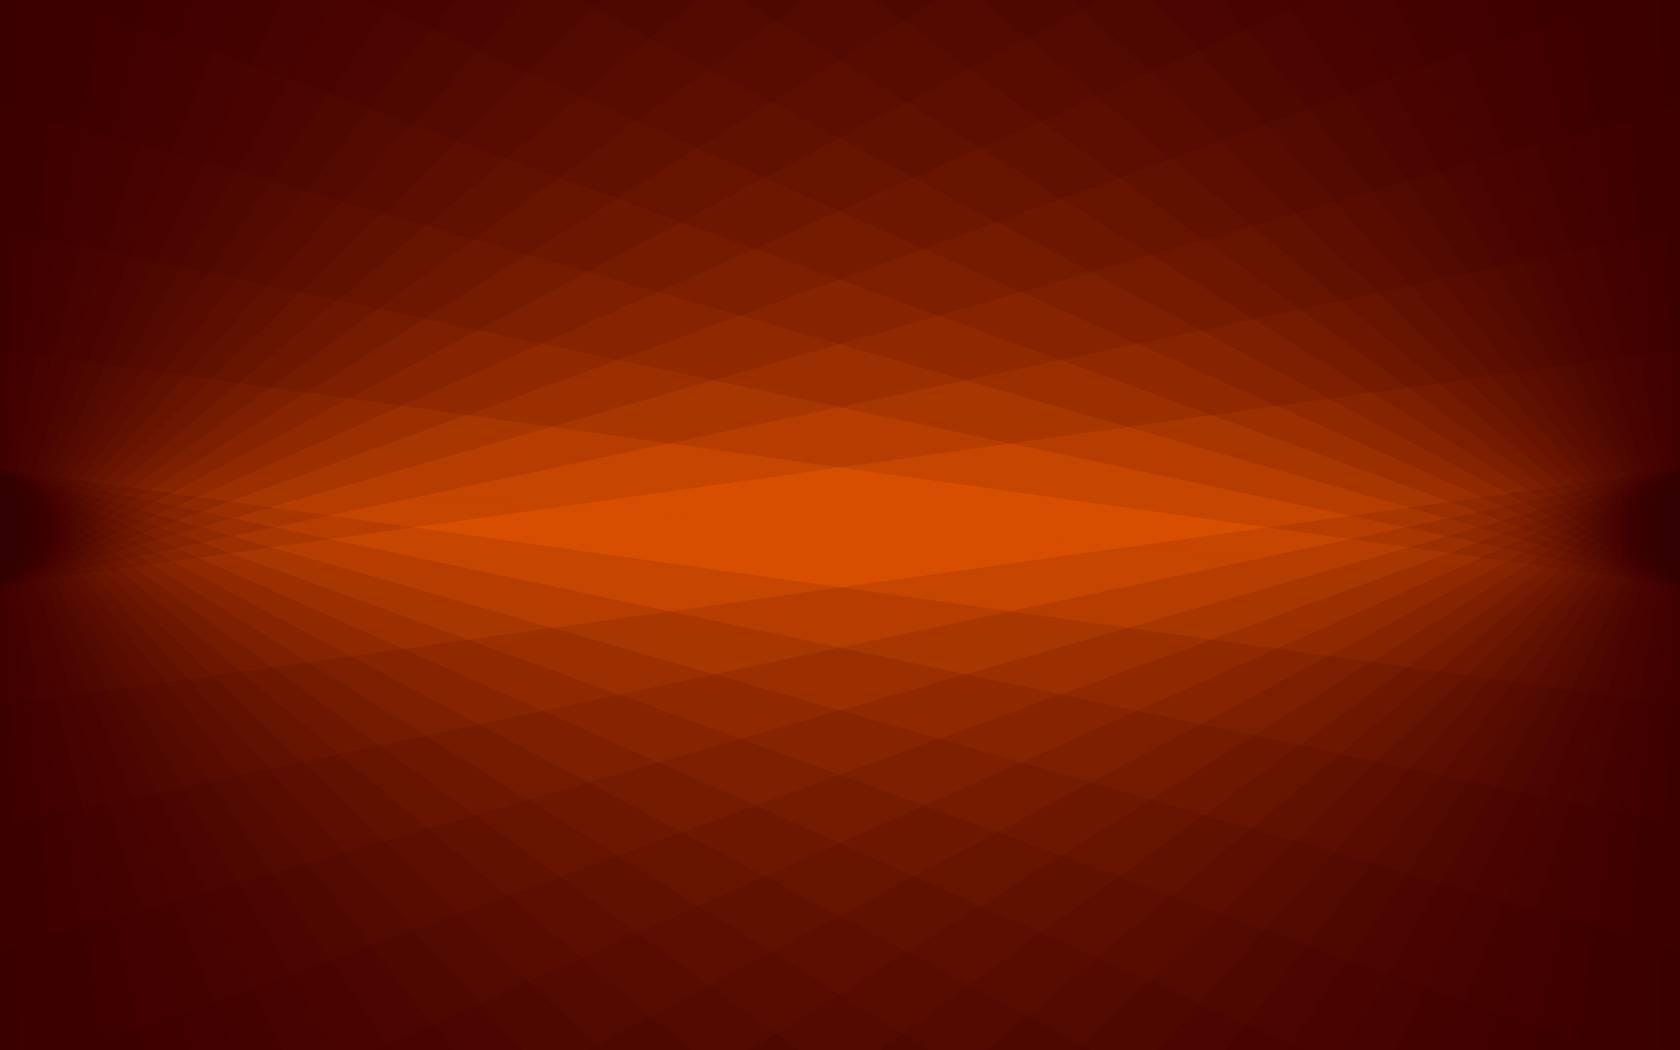 Warm Backgrounds wallpaper 1680x1050 11149 1680x1050